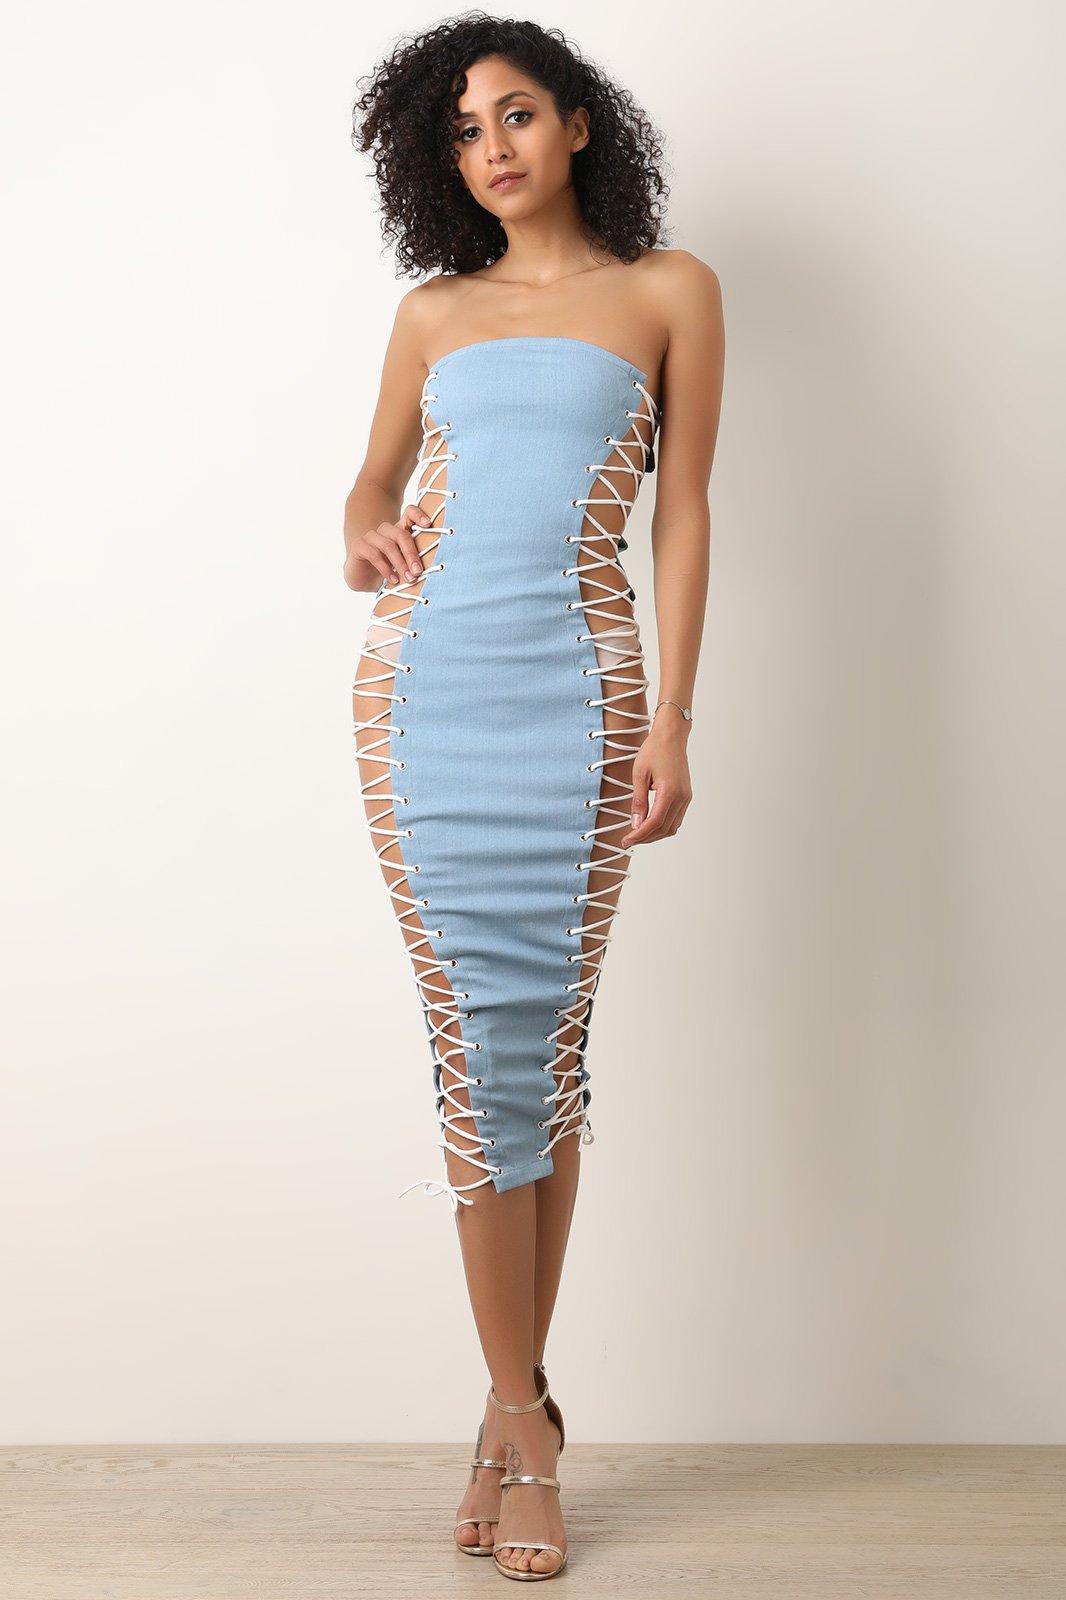 Denim Side Corset Open Lace-Up Tube Dress  tubedress  craaveme  craave   cute  beautiful